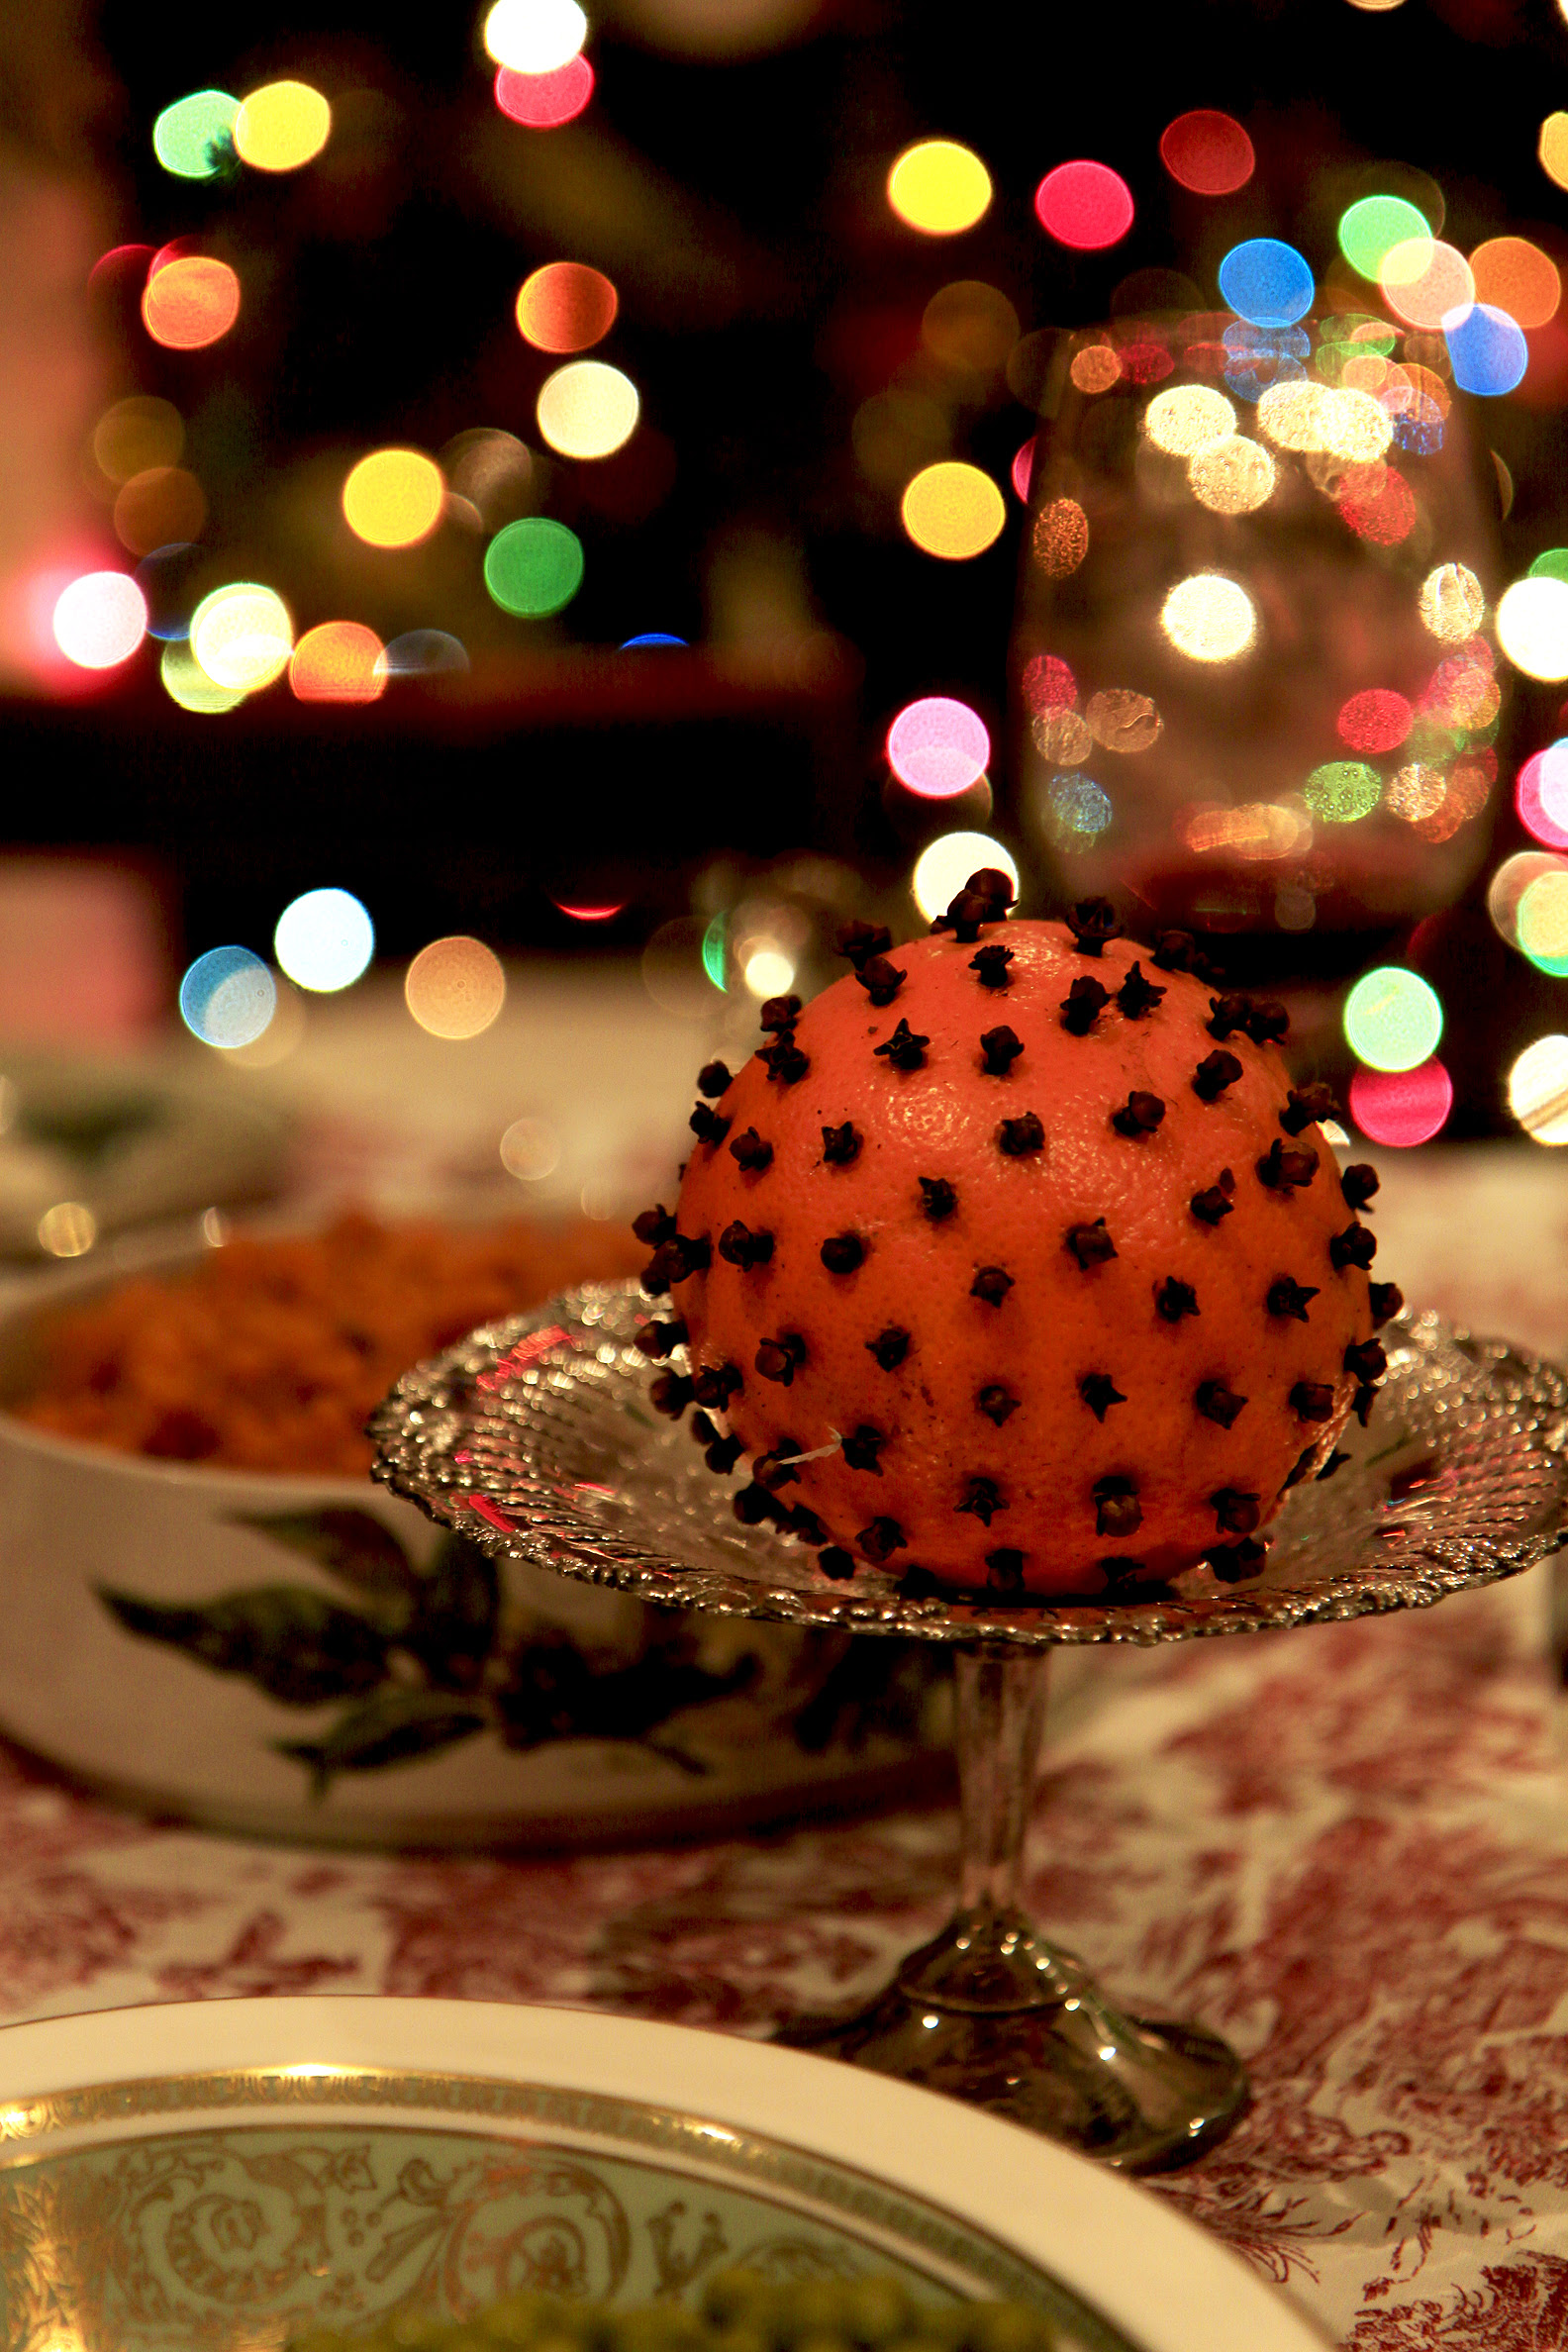 orange and cloves2